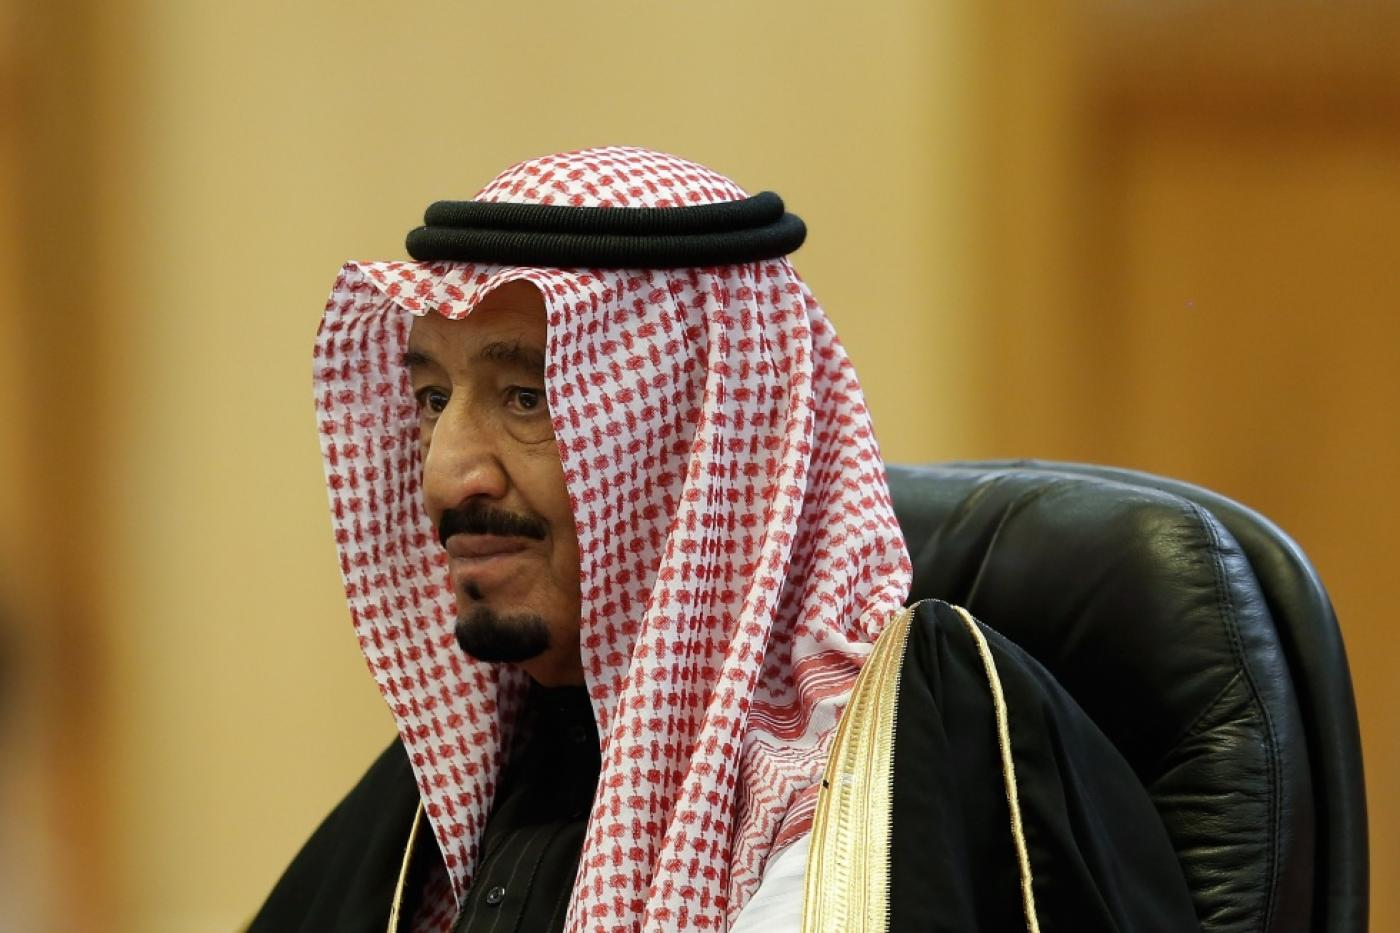 New Saudi king orders cabinet reshuffle | Middle East Eye